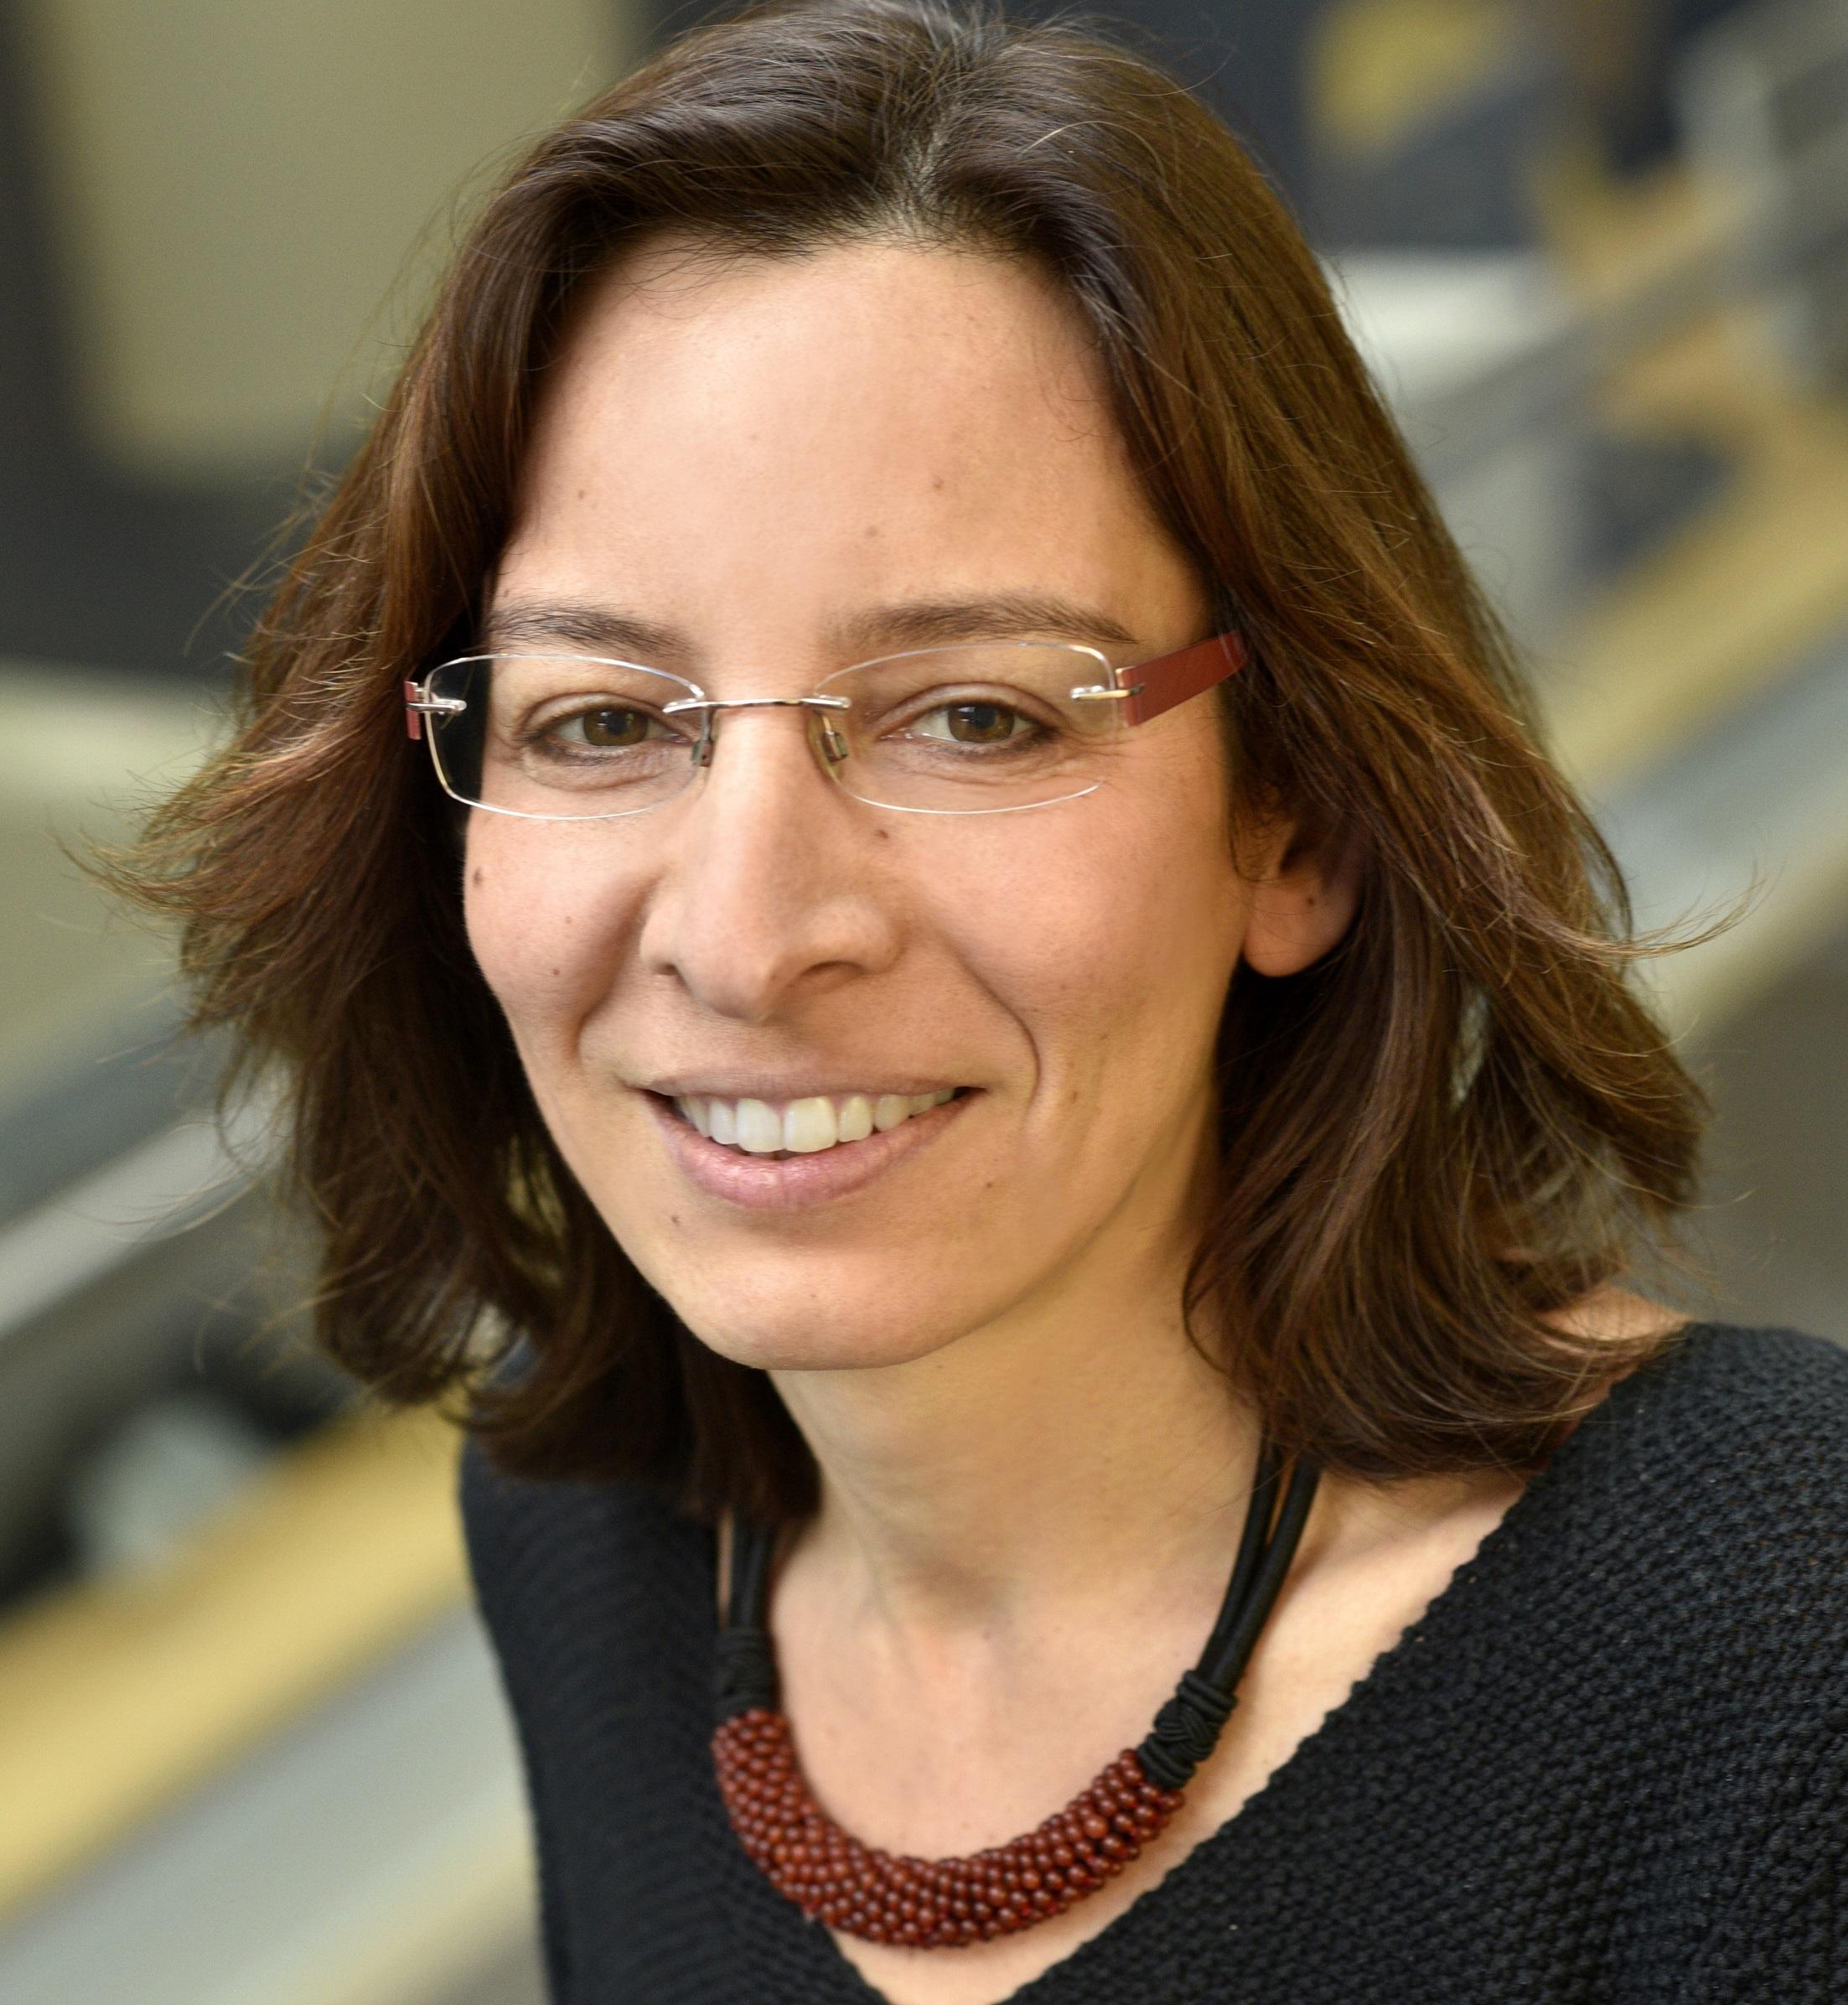 Dr Cristina Renzi